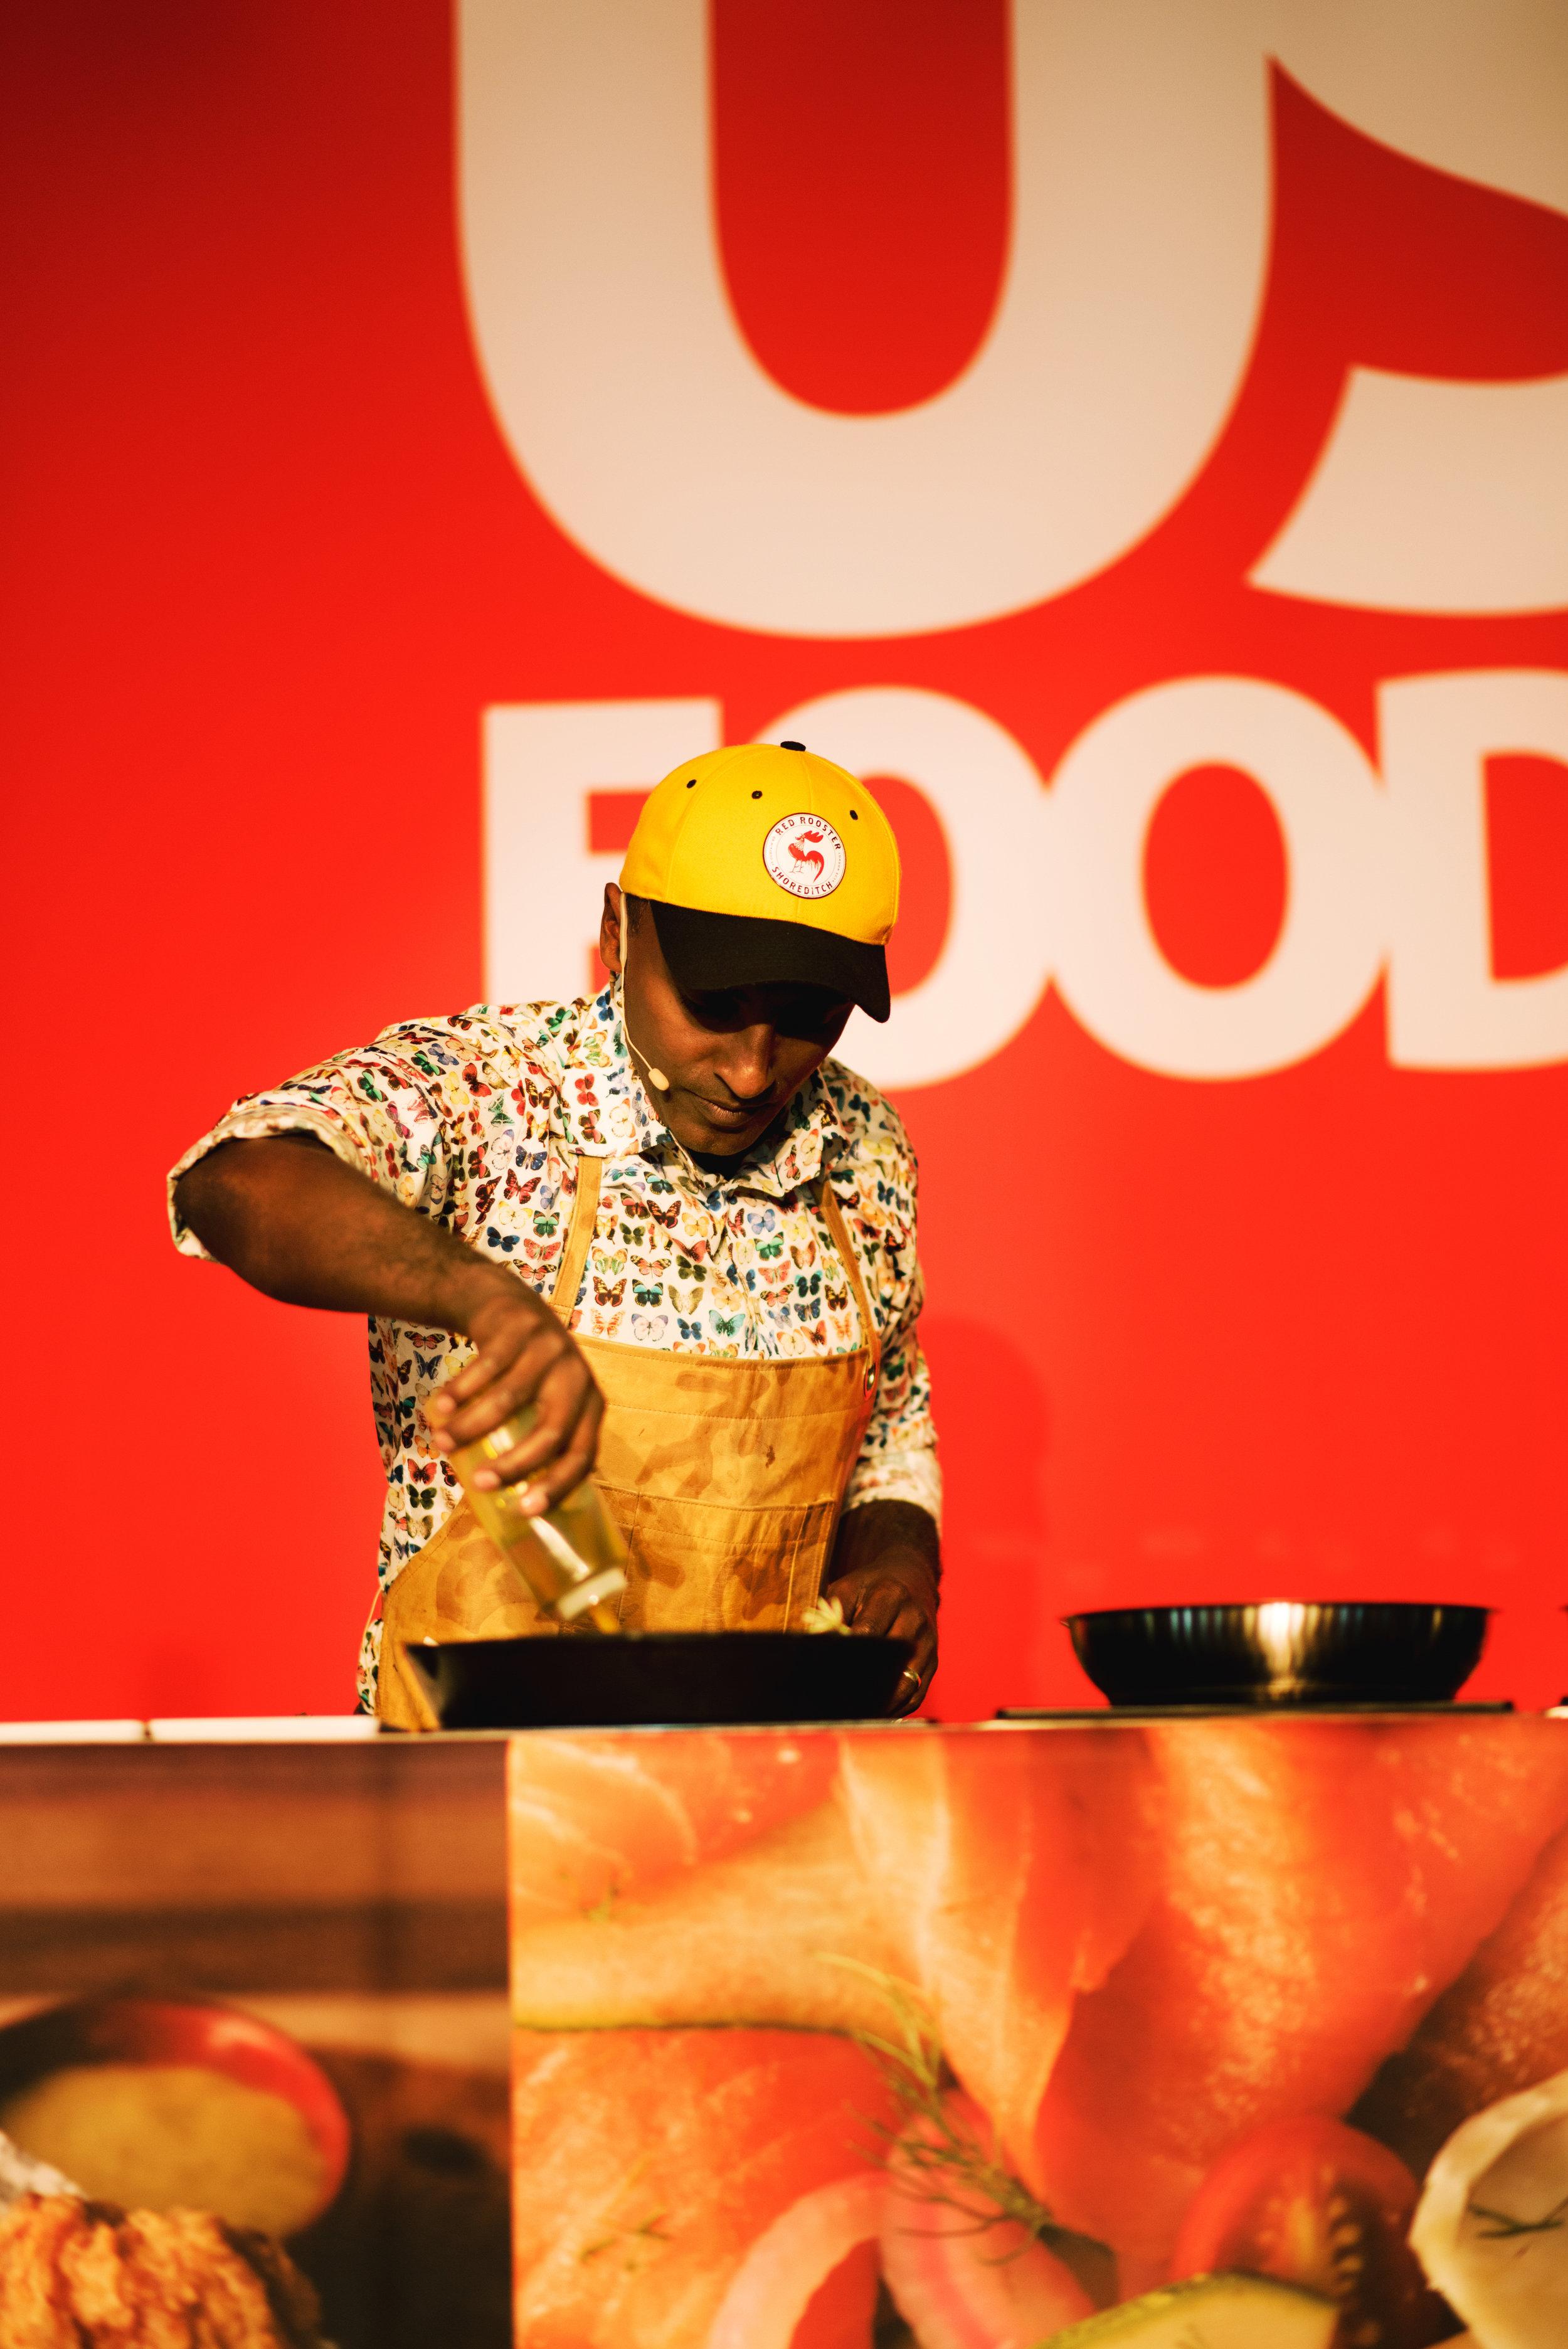 FoodFanaticsLive-Event-Food-Photography049.jpg